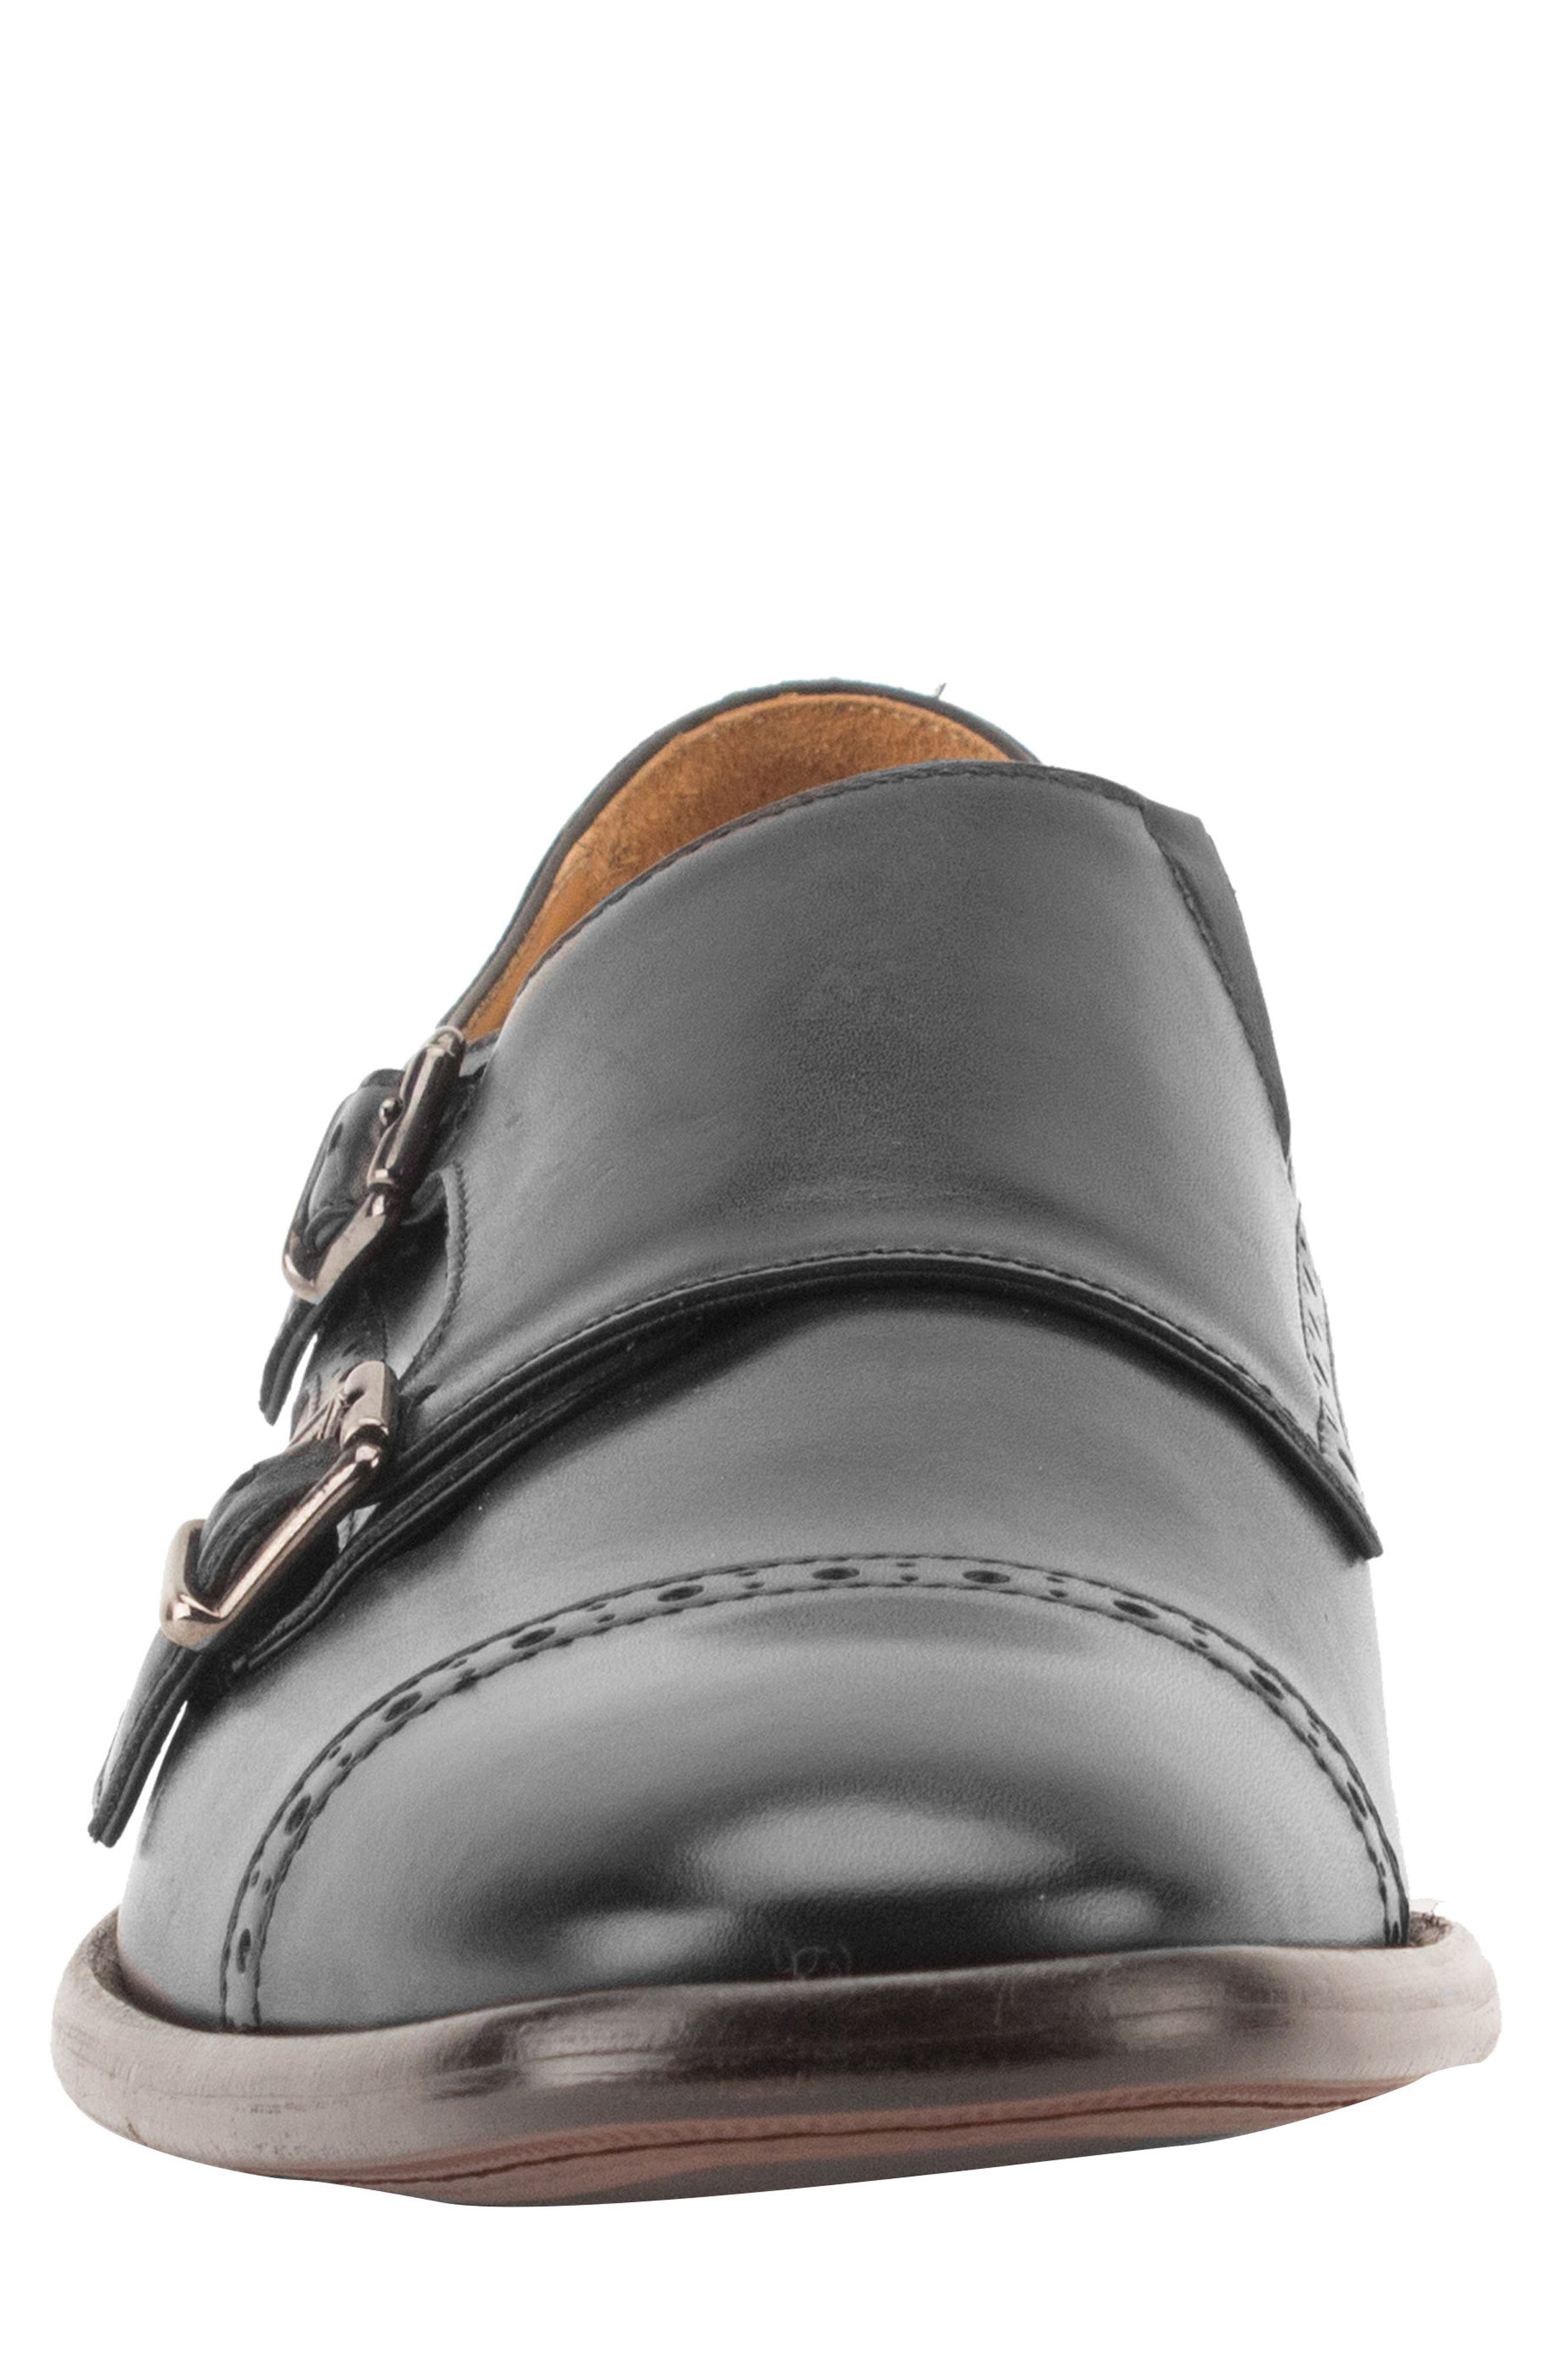 Corbett Cap Toe Double Strap Monk Shoe,                             Alternate thumbnail 4, color,                             001